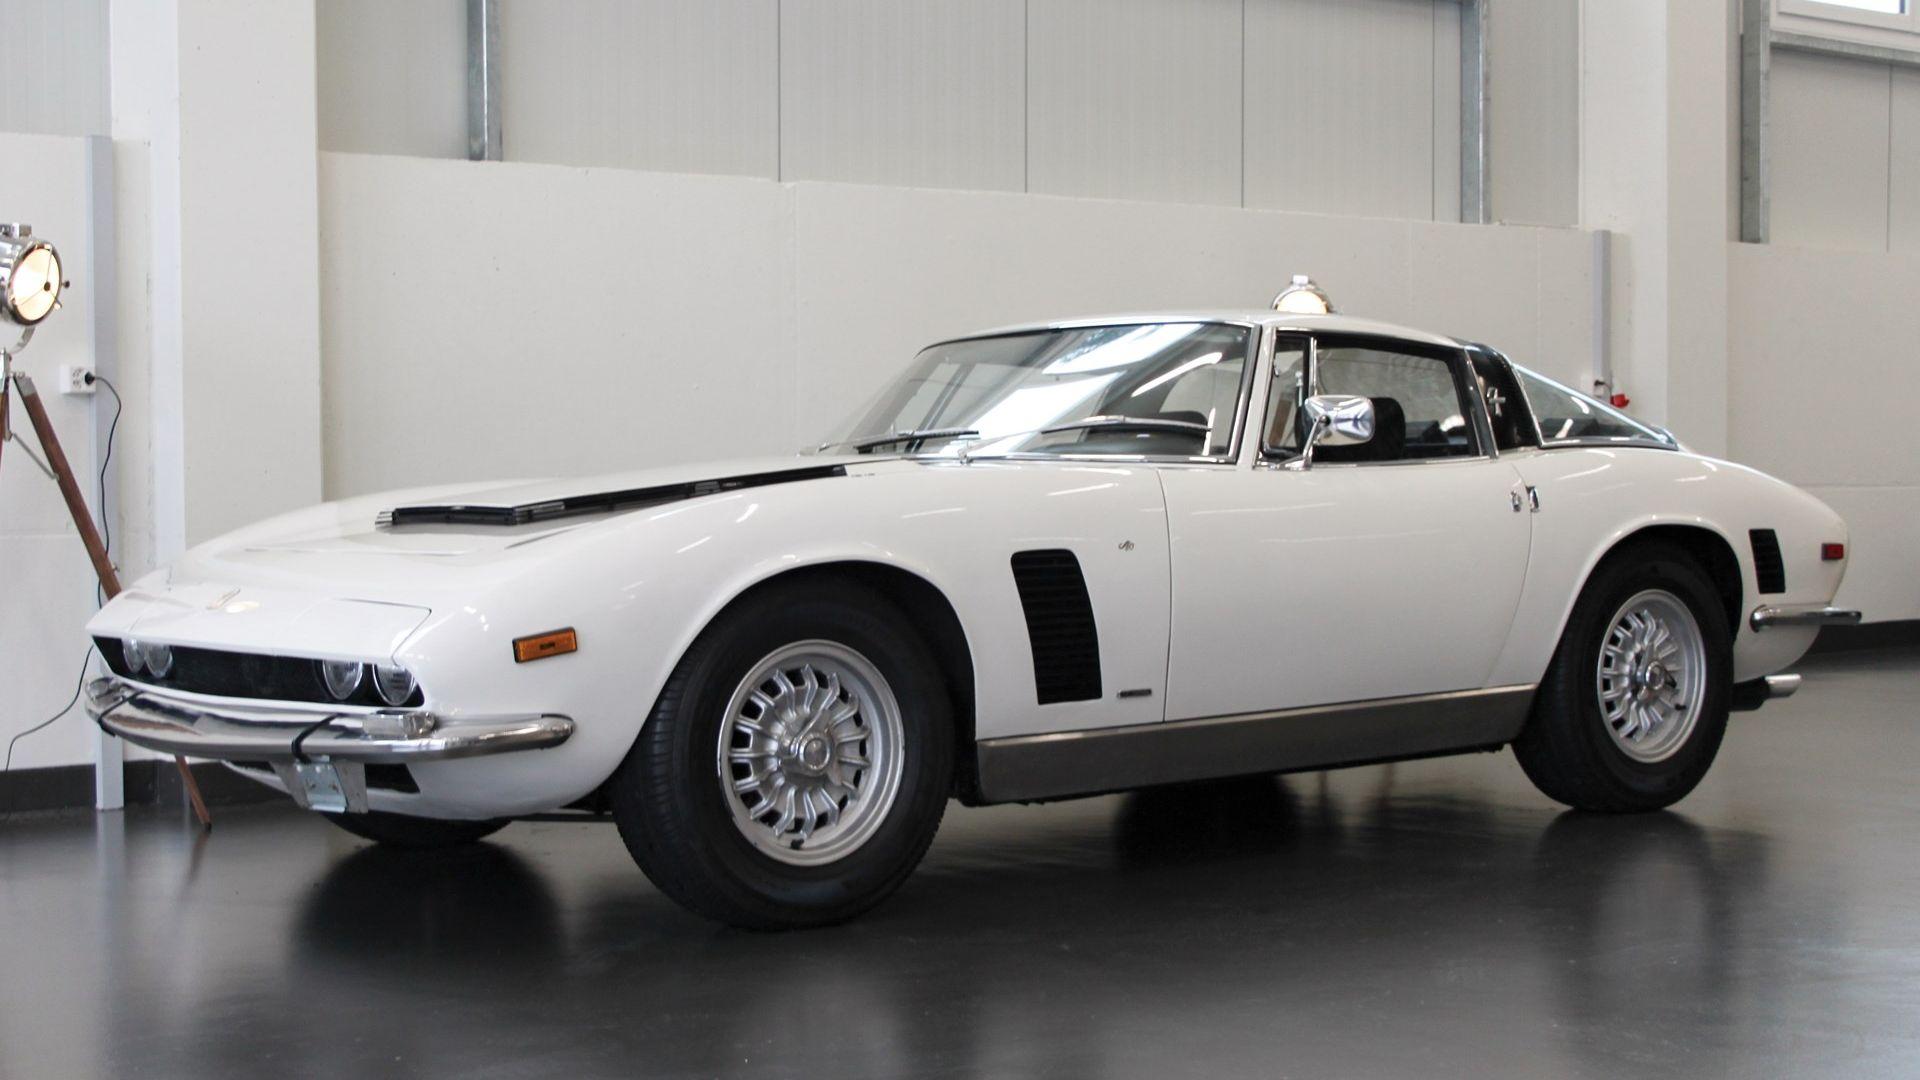 1971 Iso Grifo 7-Litre Series II